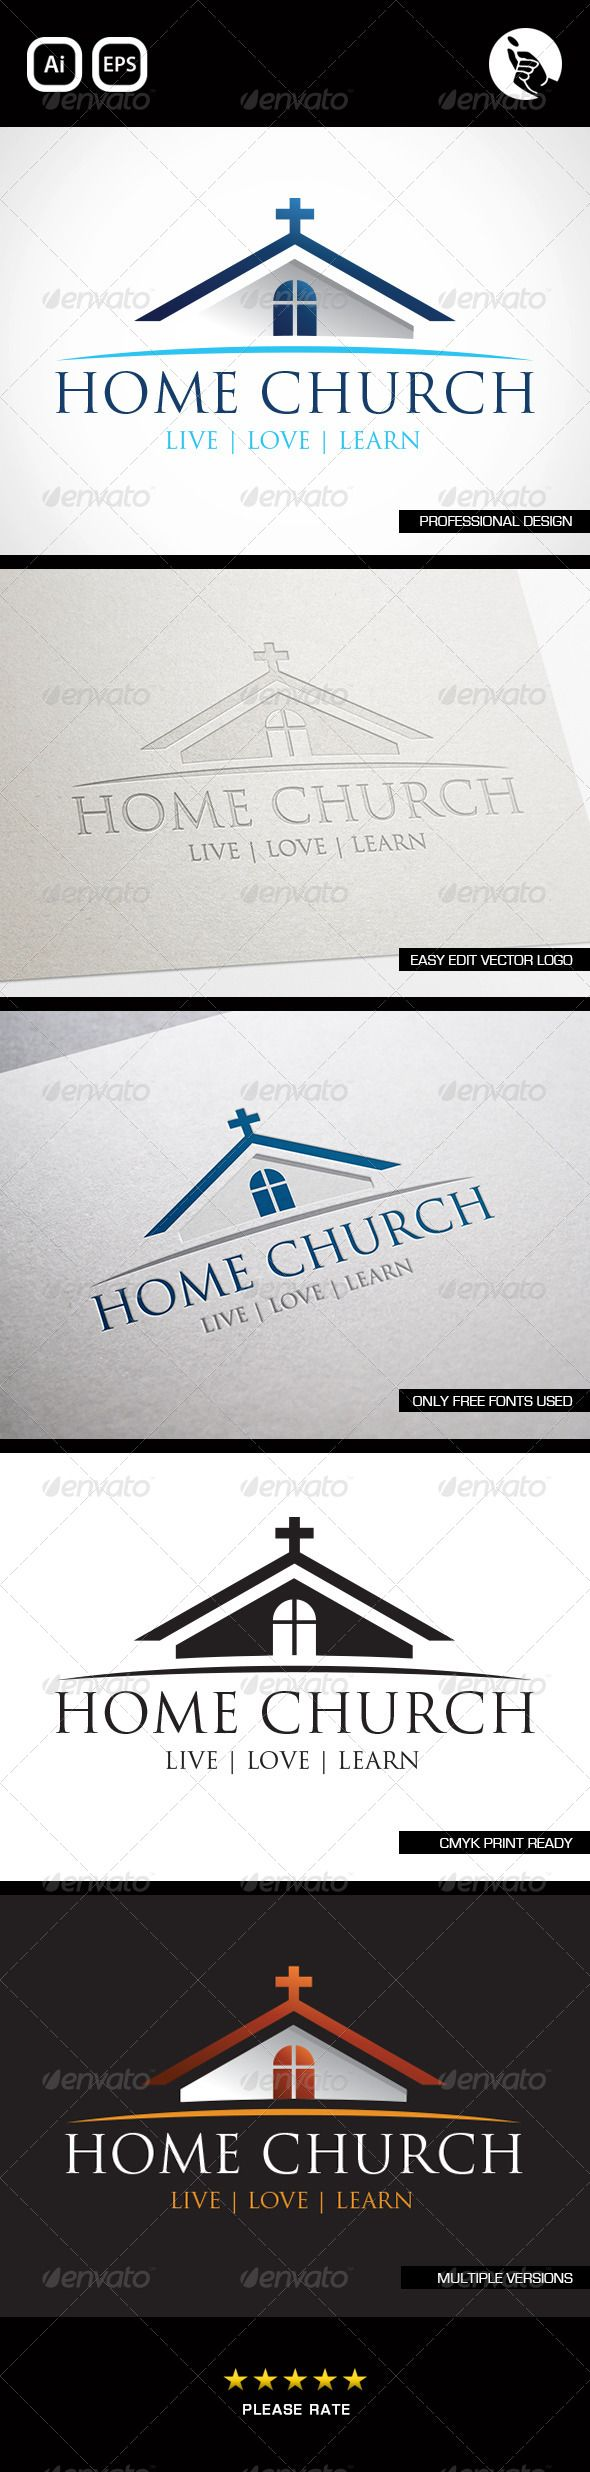 Home Church Logo Design Template Vector #logotype Download it here:  http://graphicriver.net/item/home-church-logo/4543341?s_rank=43?ref=nexion